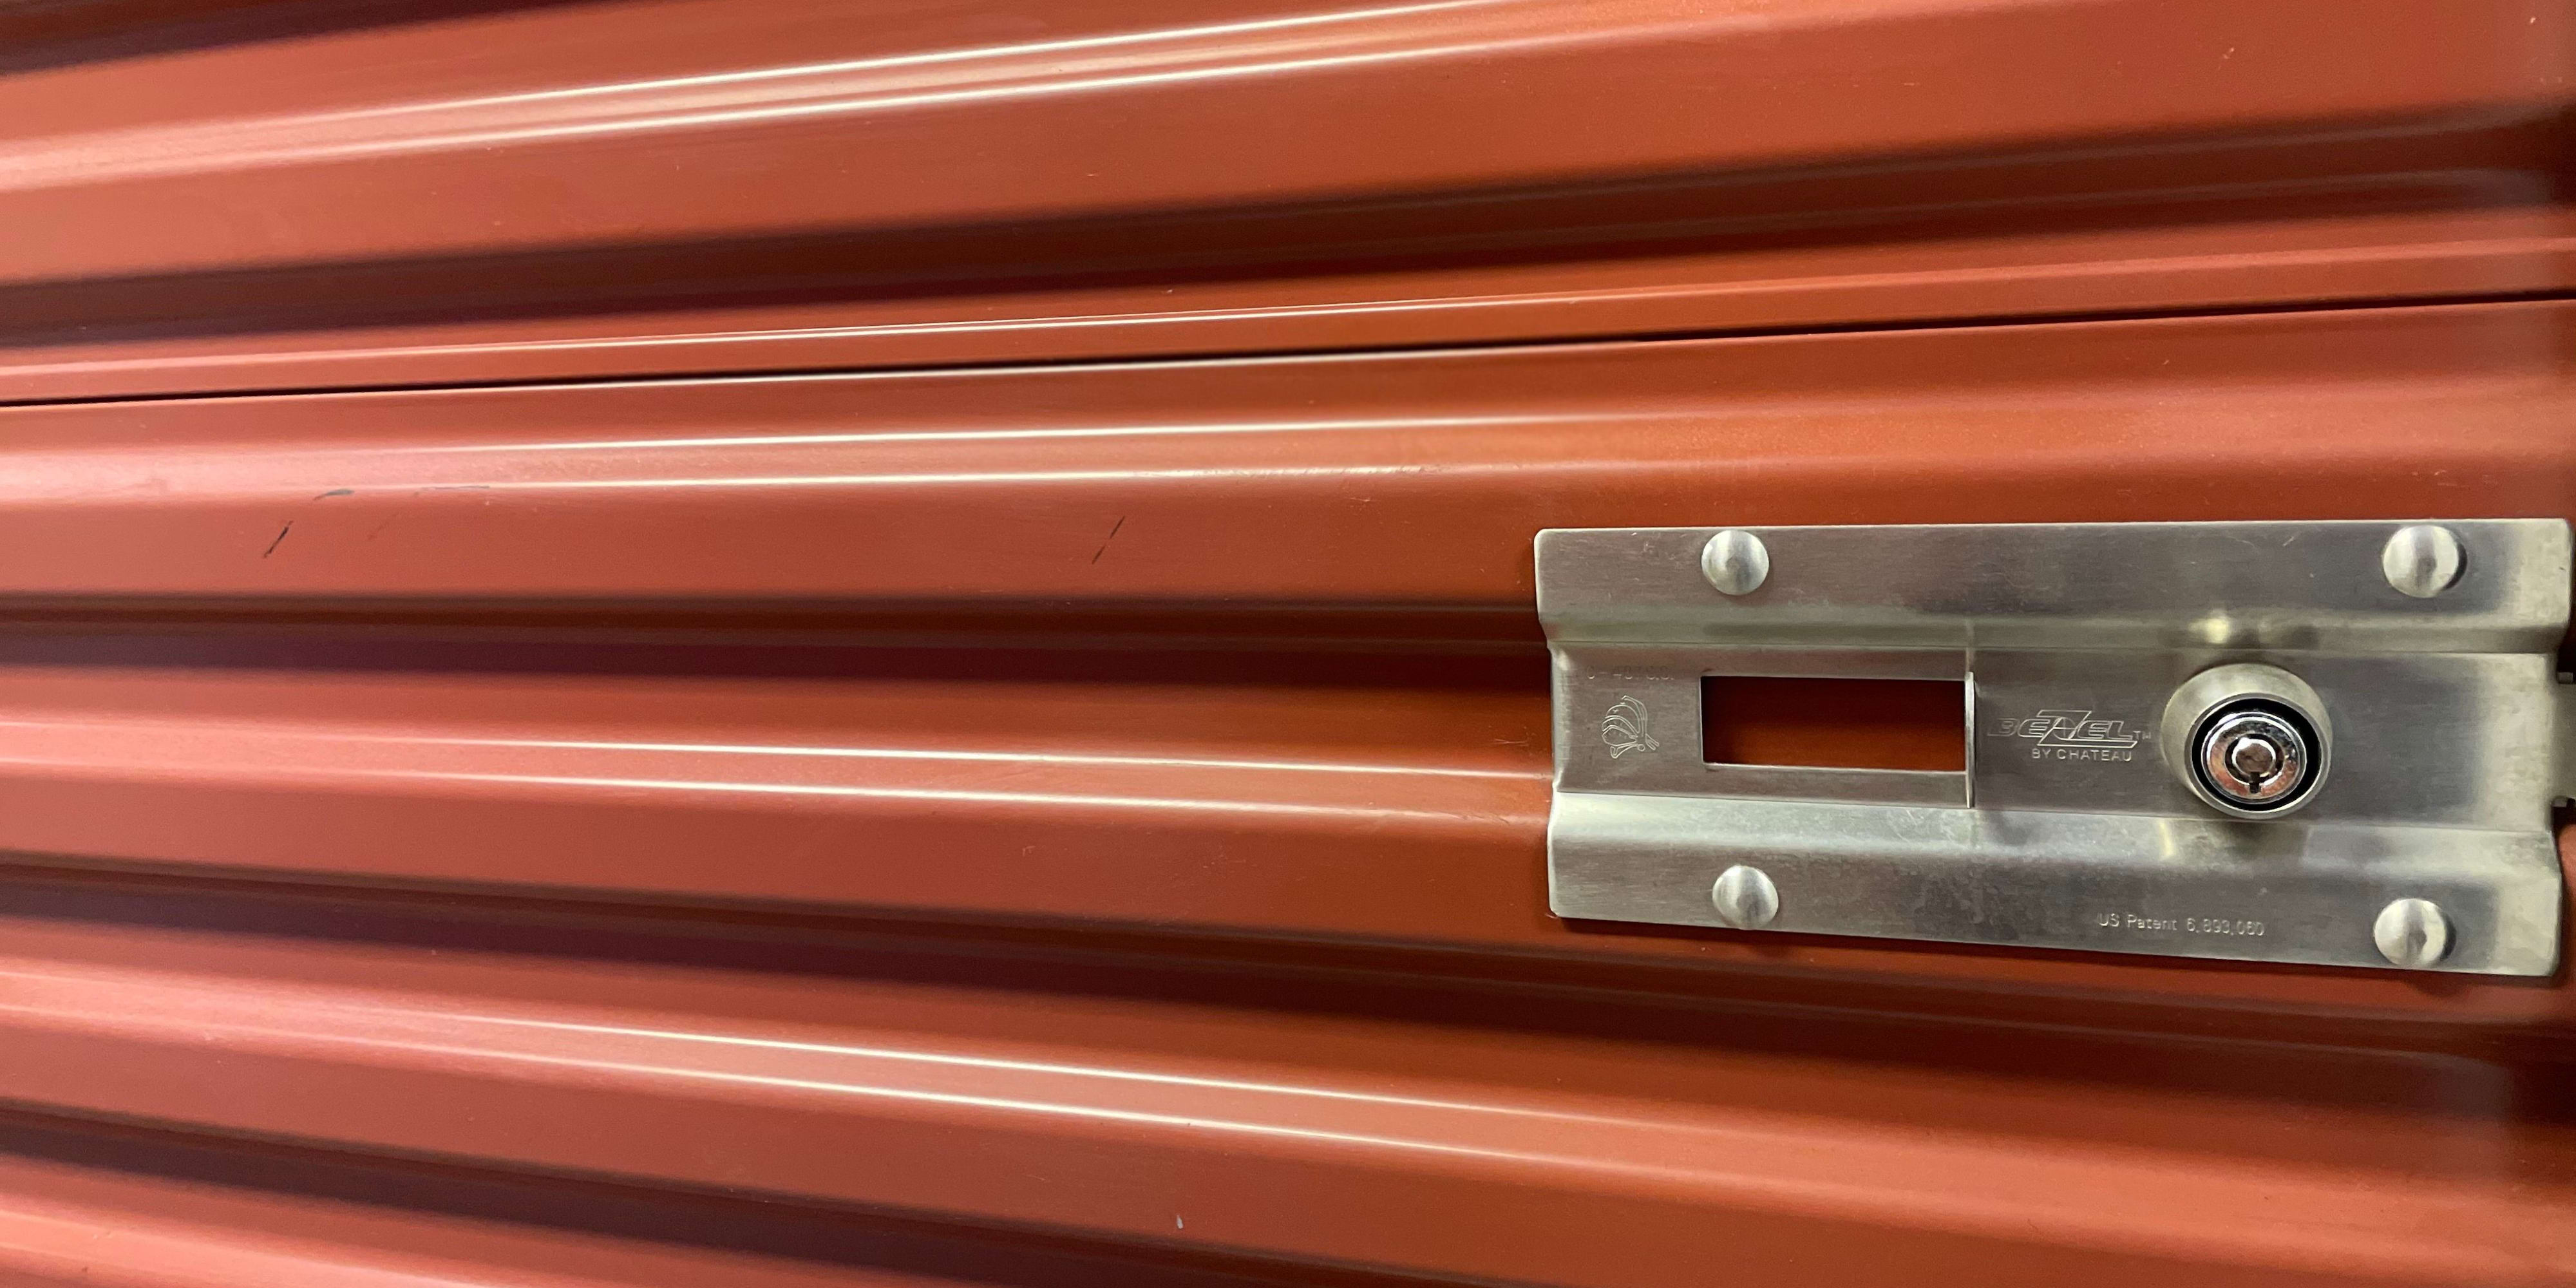 Red storage locker door at SOJO Self Storage in South Jordan, Utah